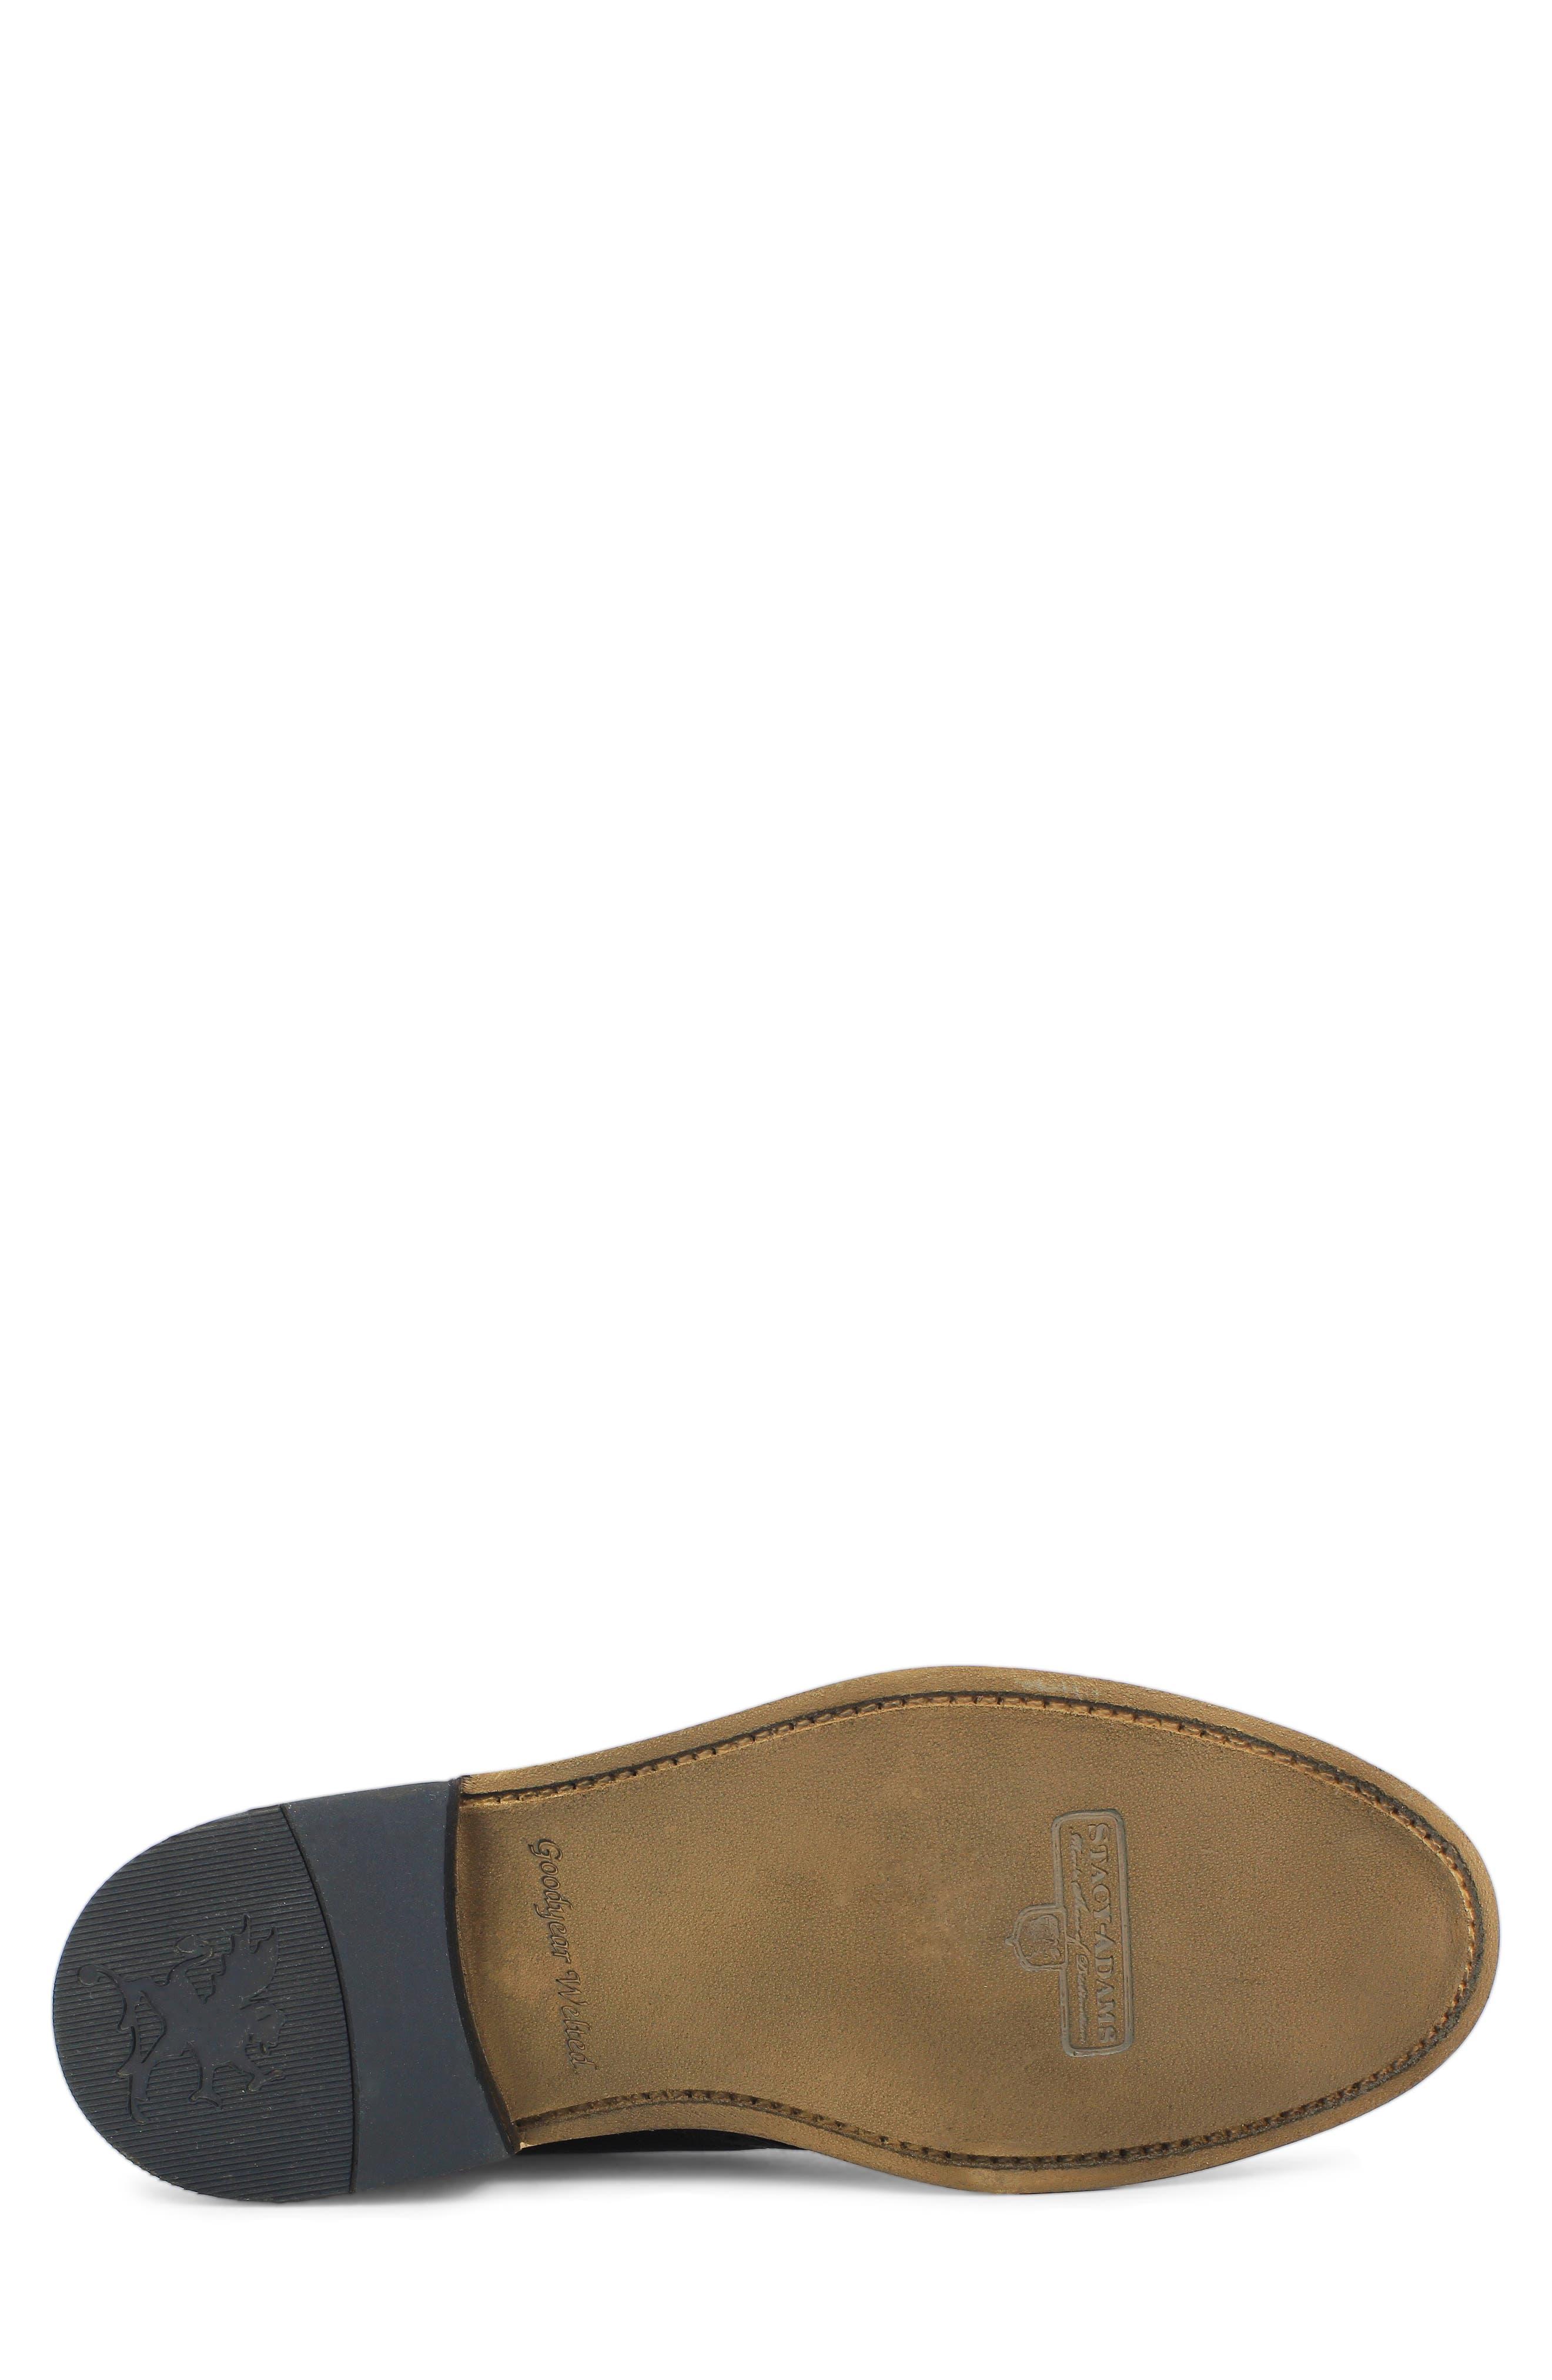 'Madison II' Chukka Boot,                             Alternate thumbnail 4, color,                             001